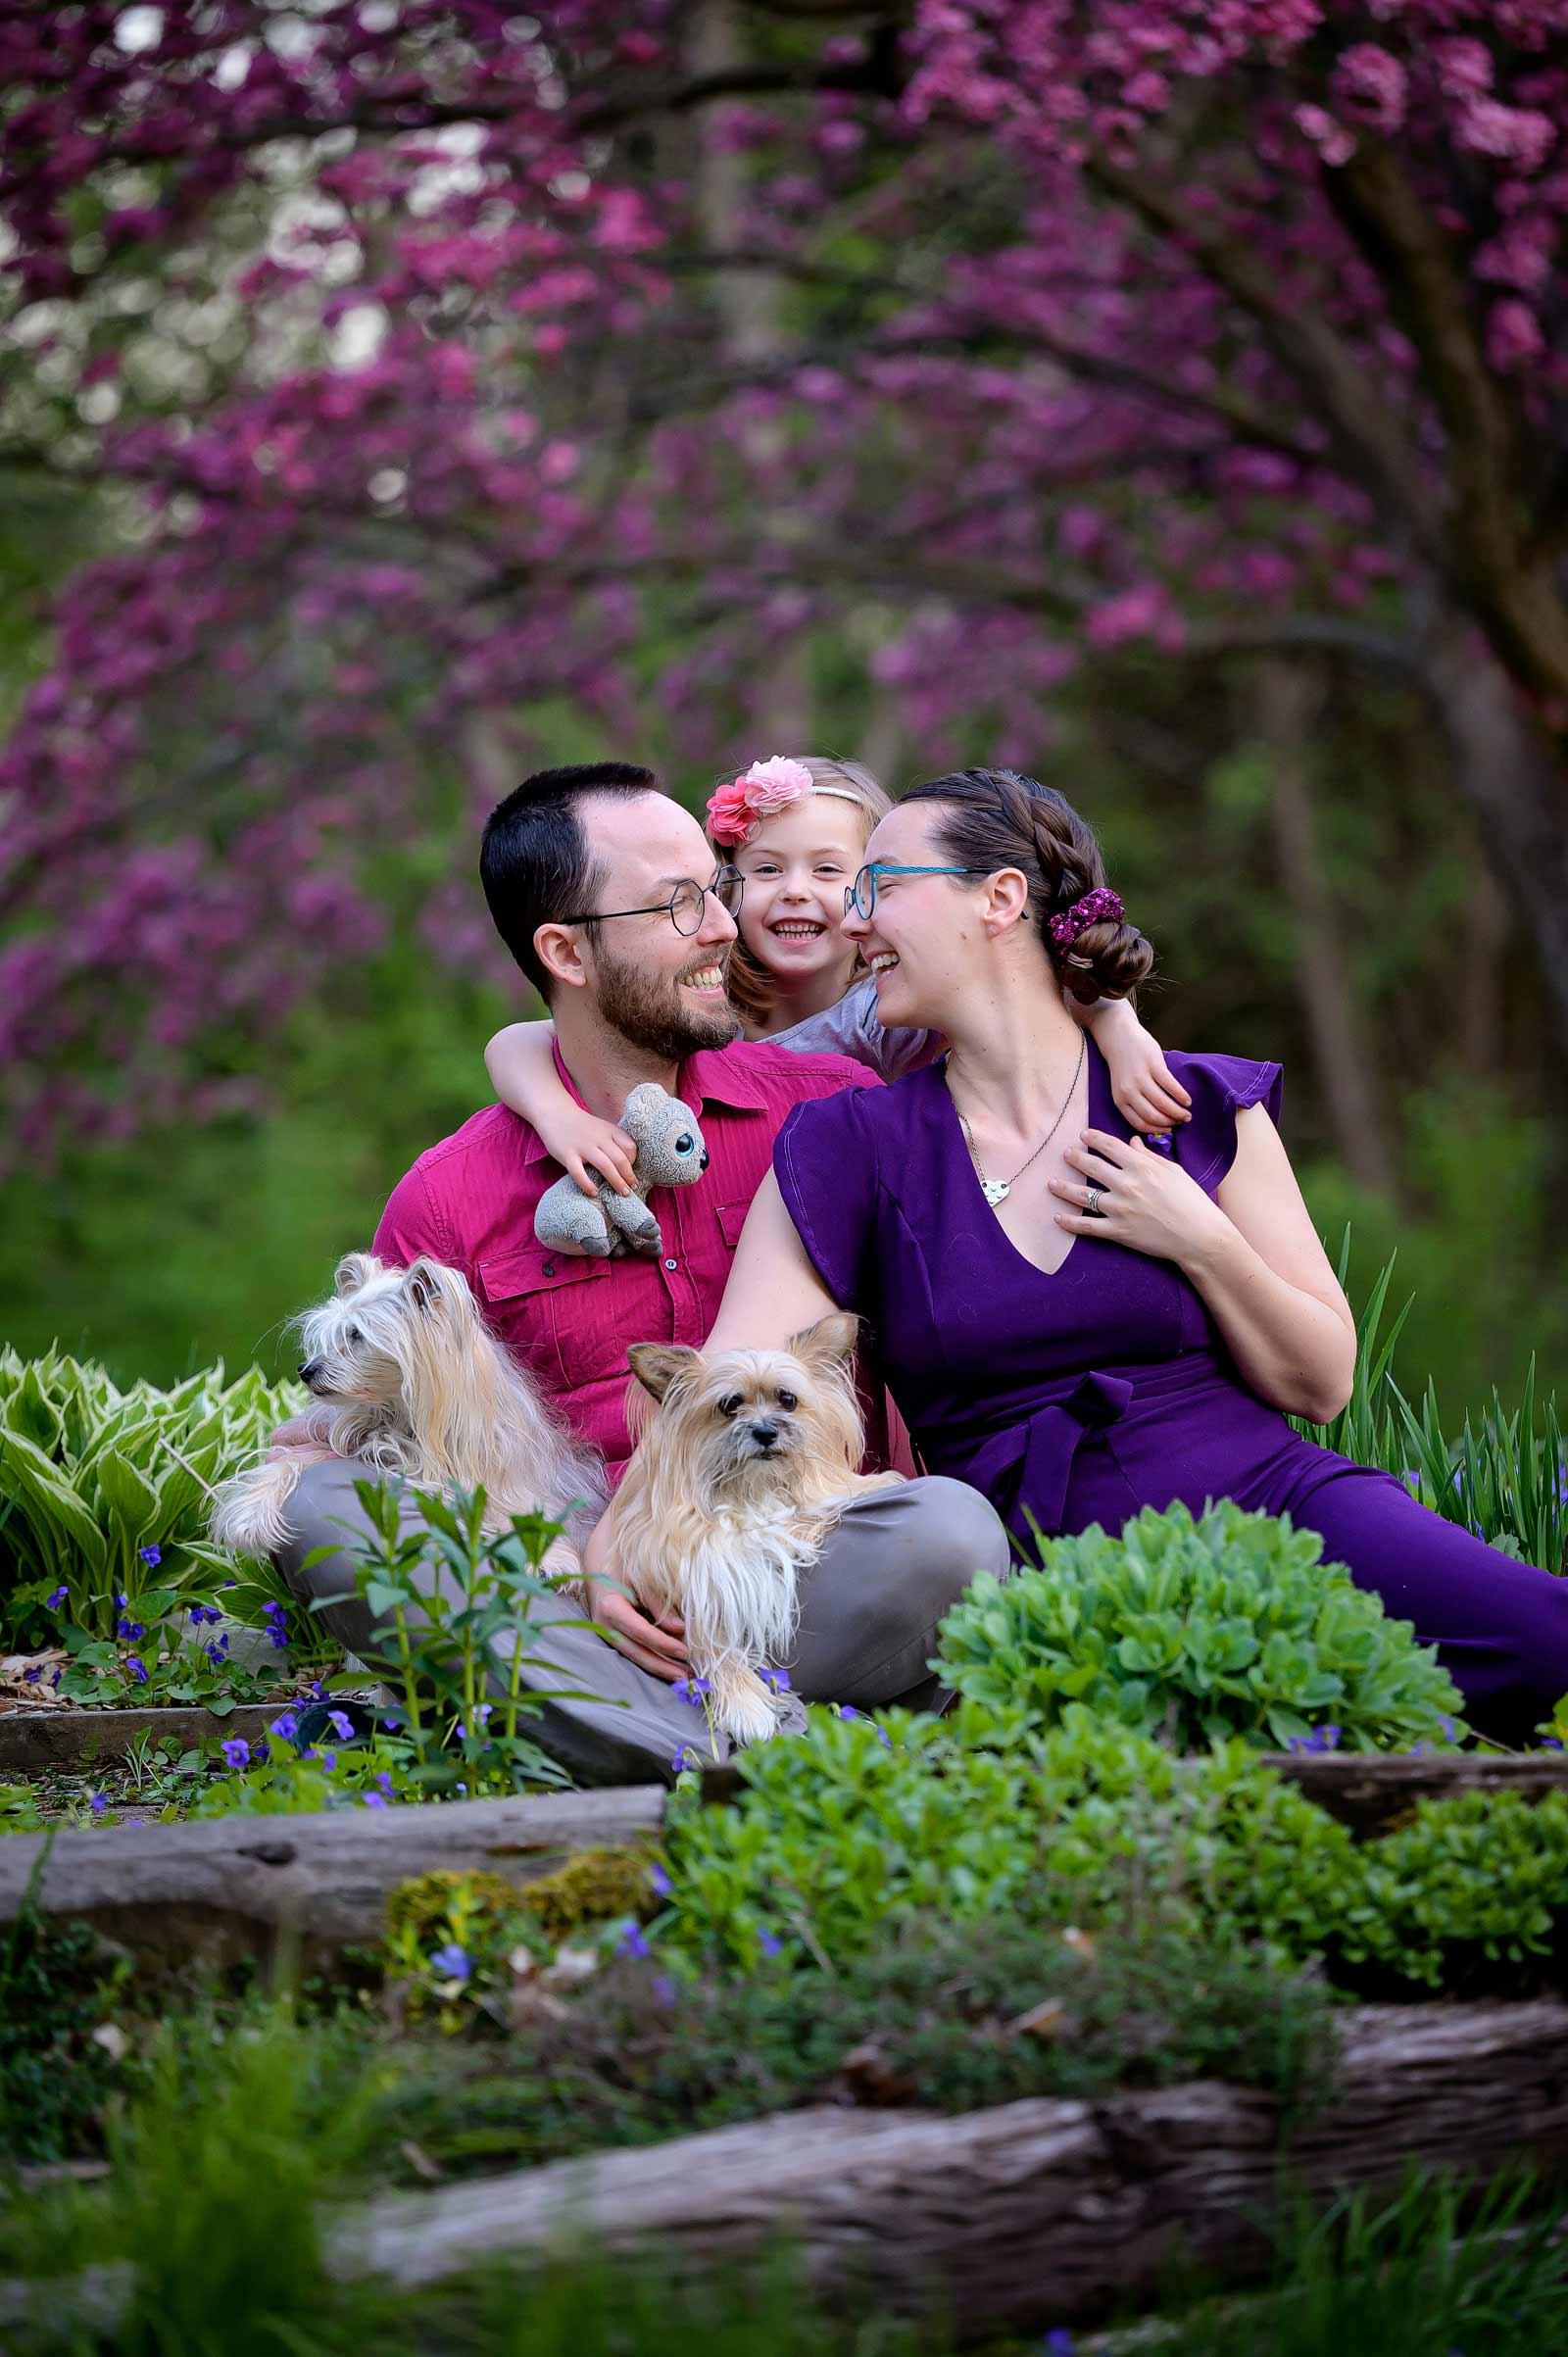 bradleyfamily-spring2021-31